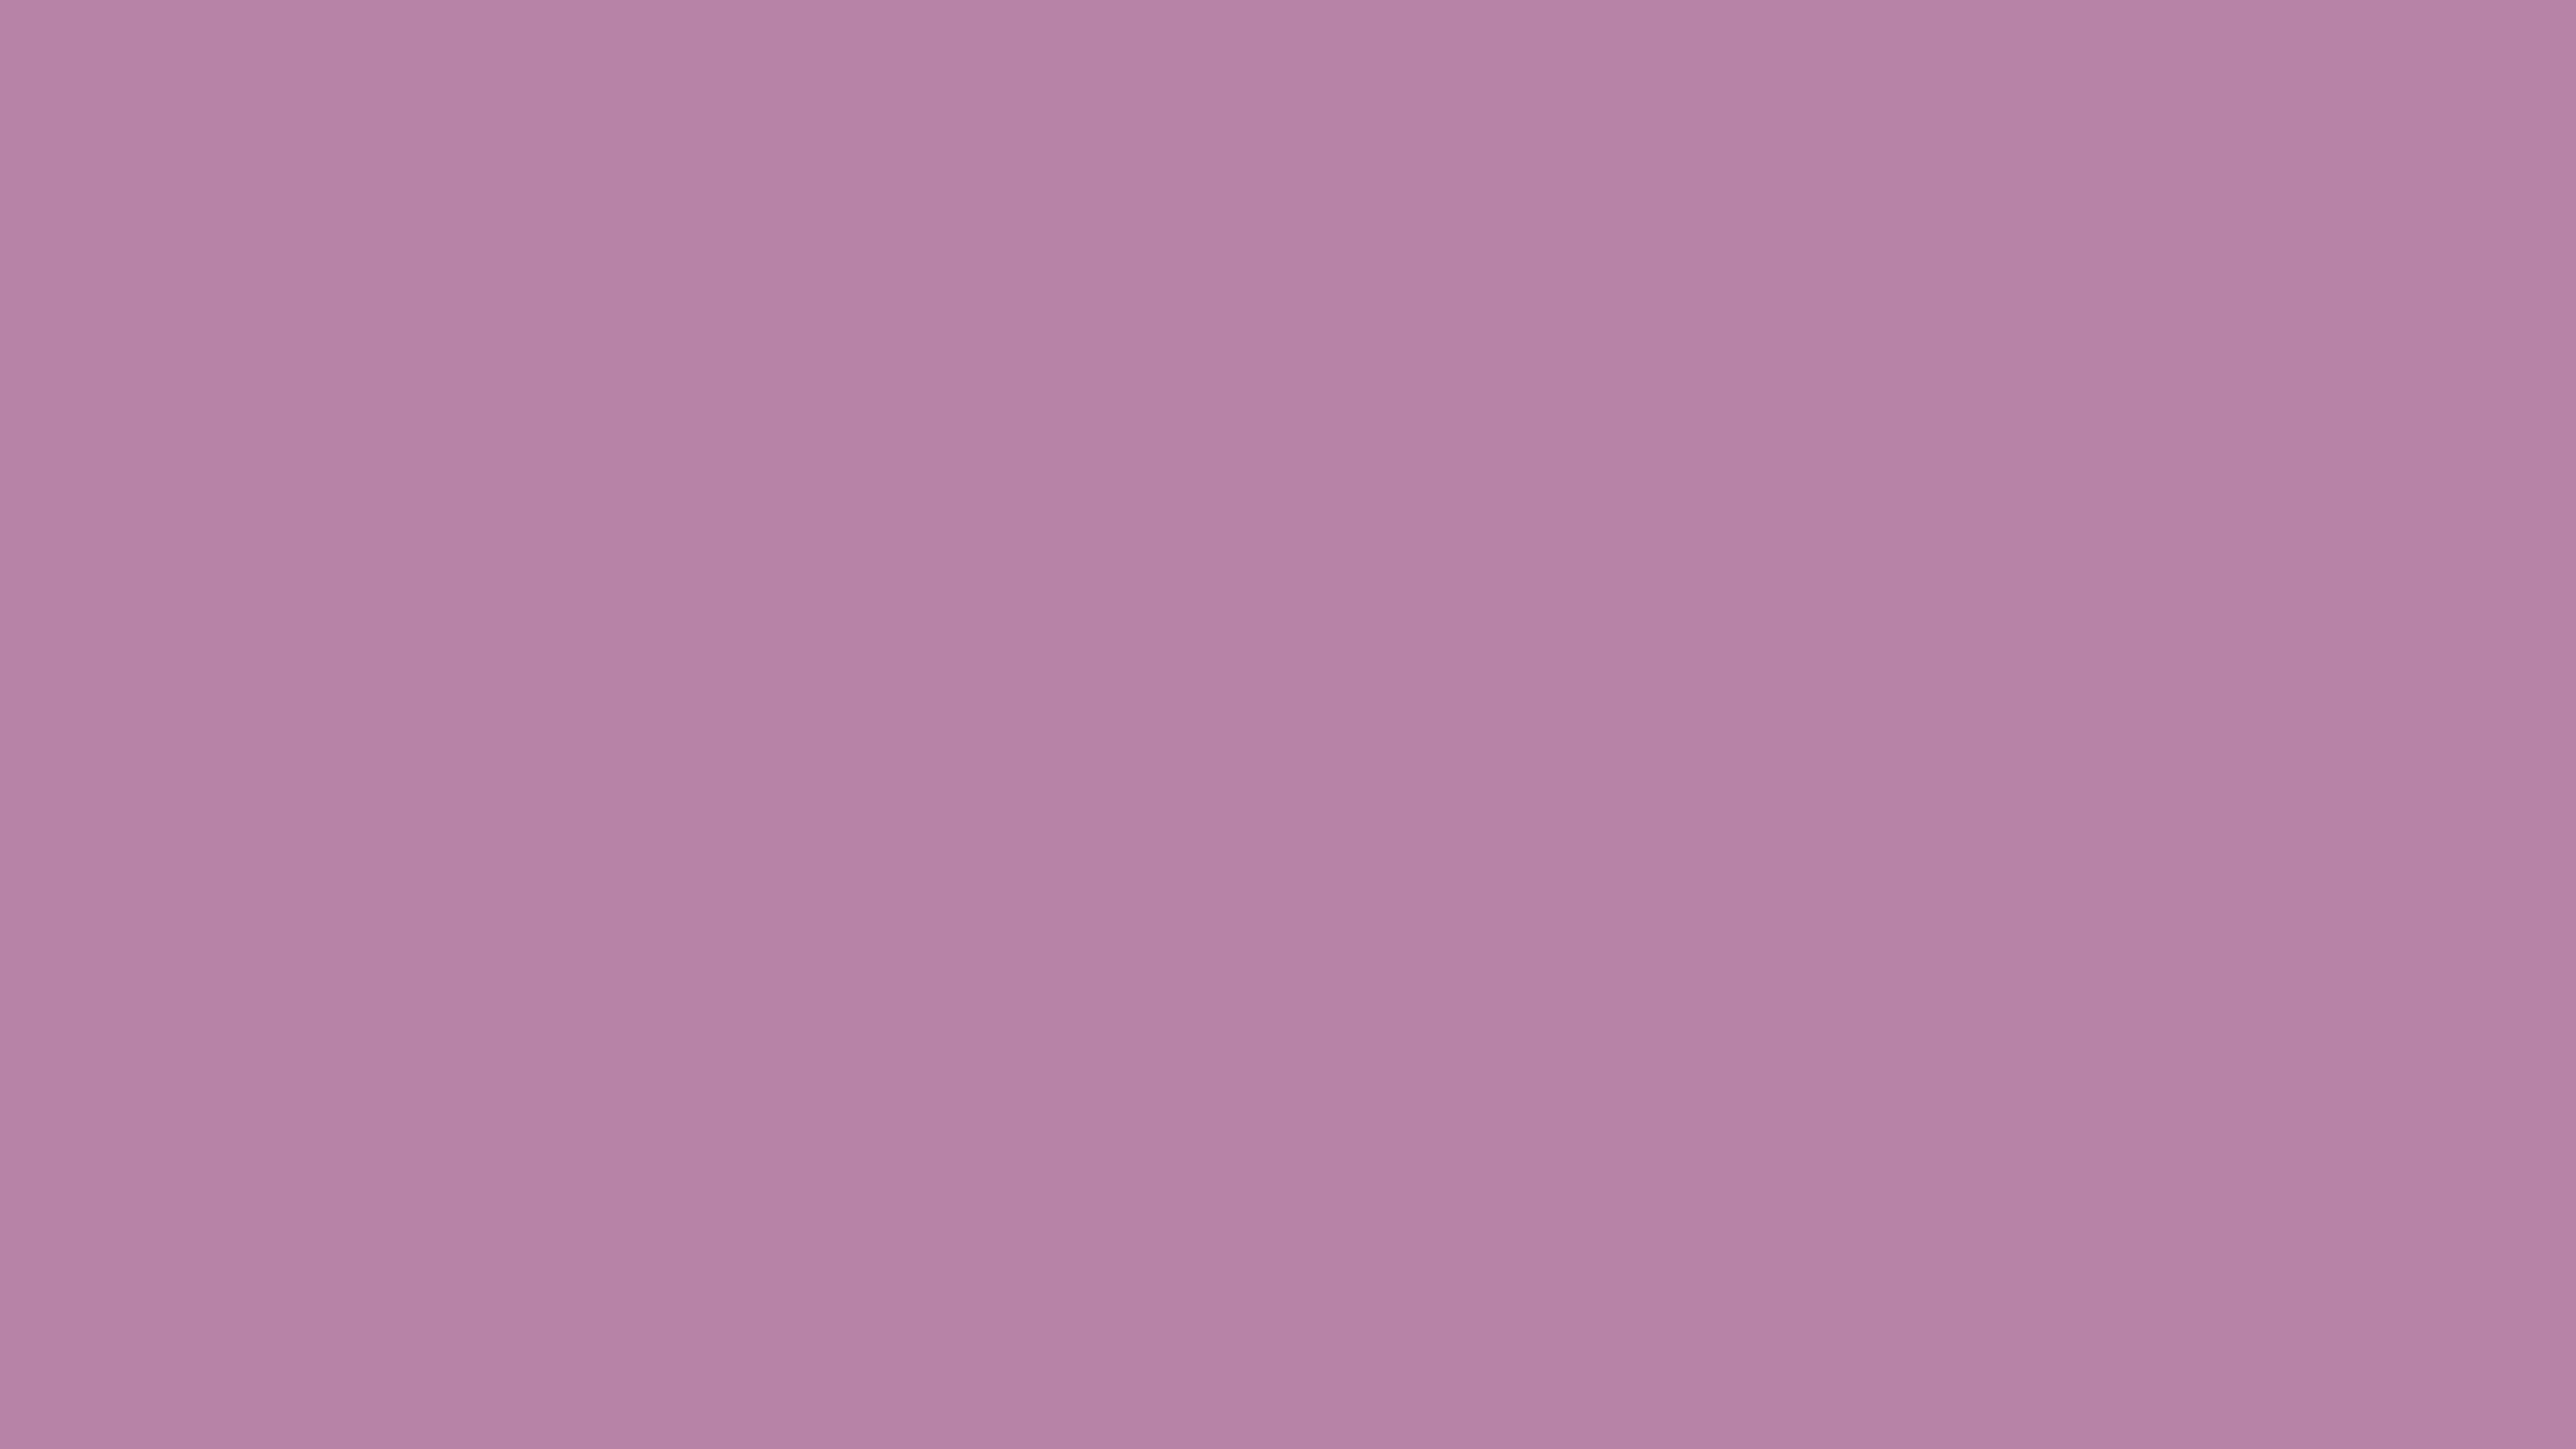 5120x2880 Opera Mauve Solid Color Background